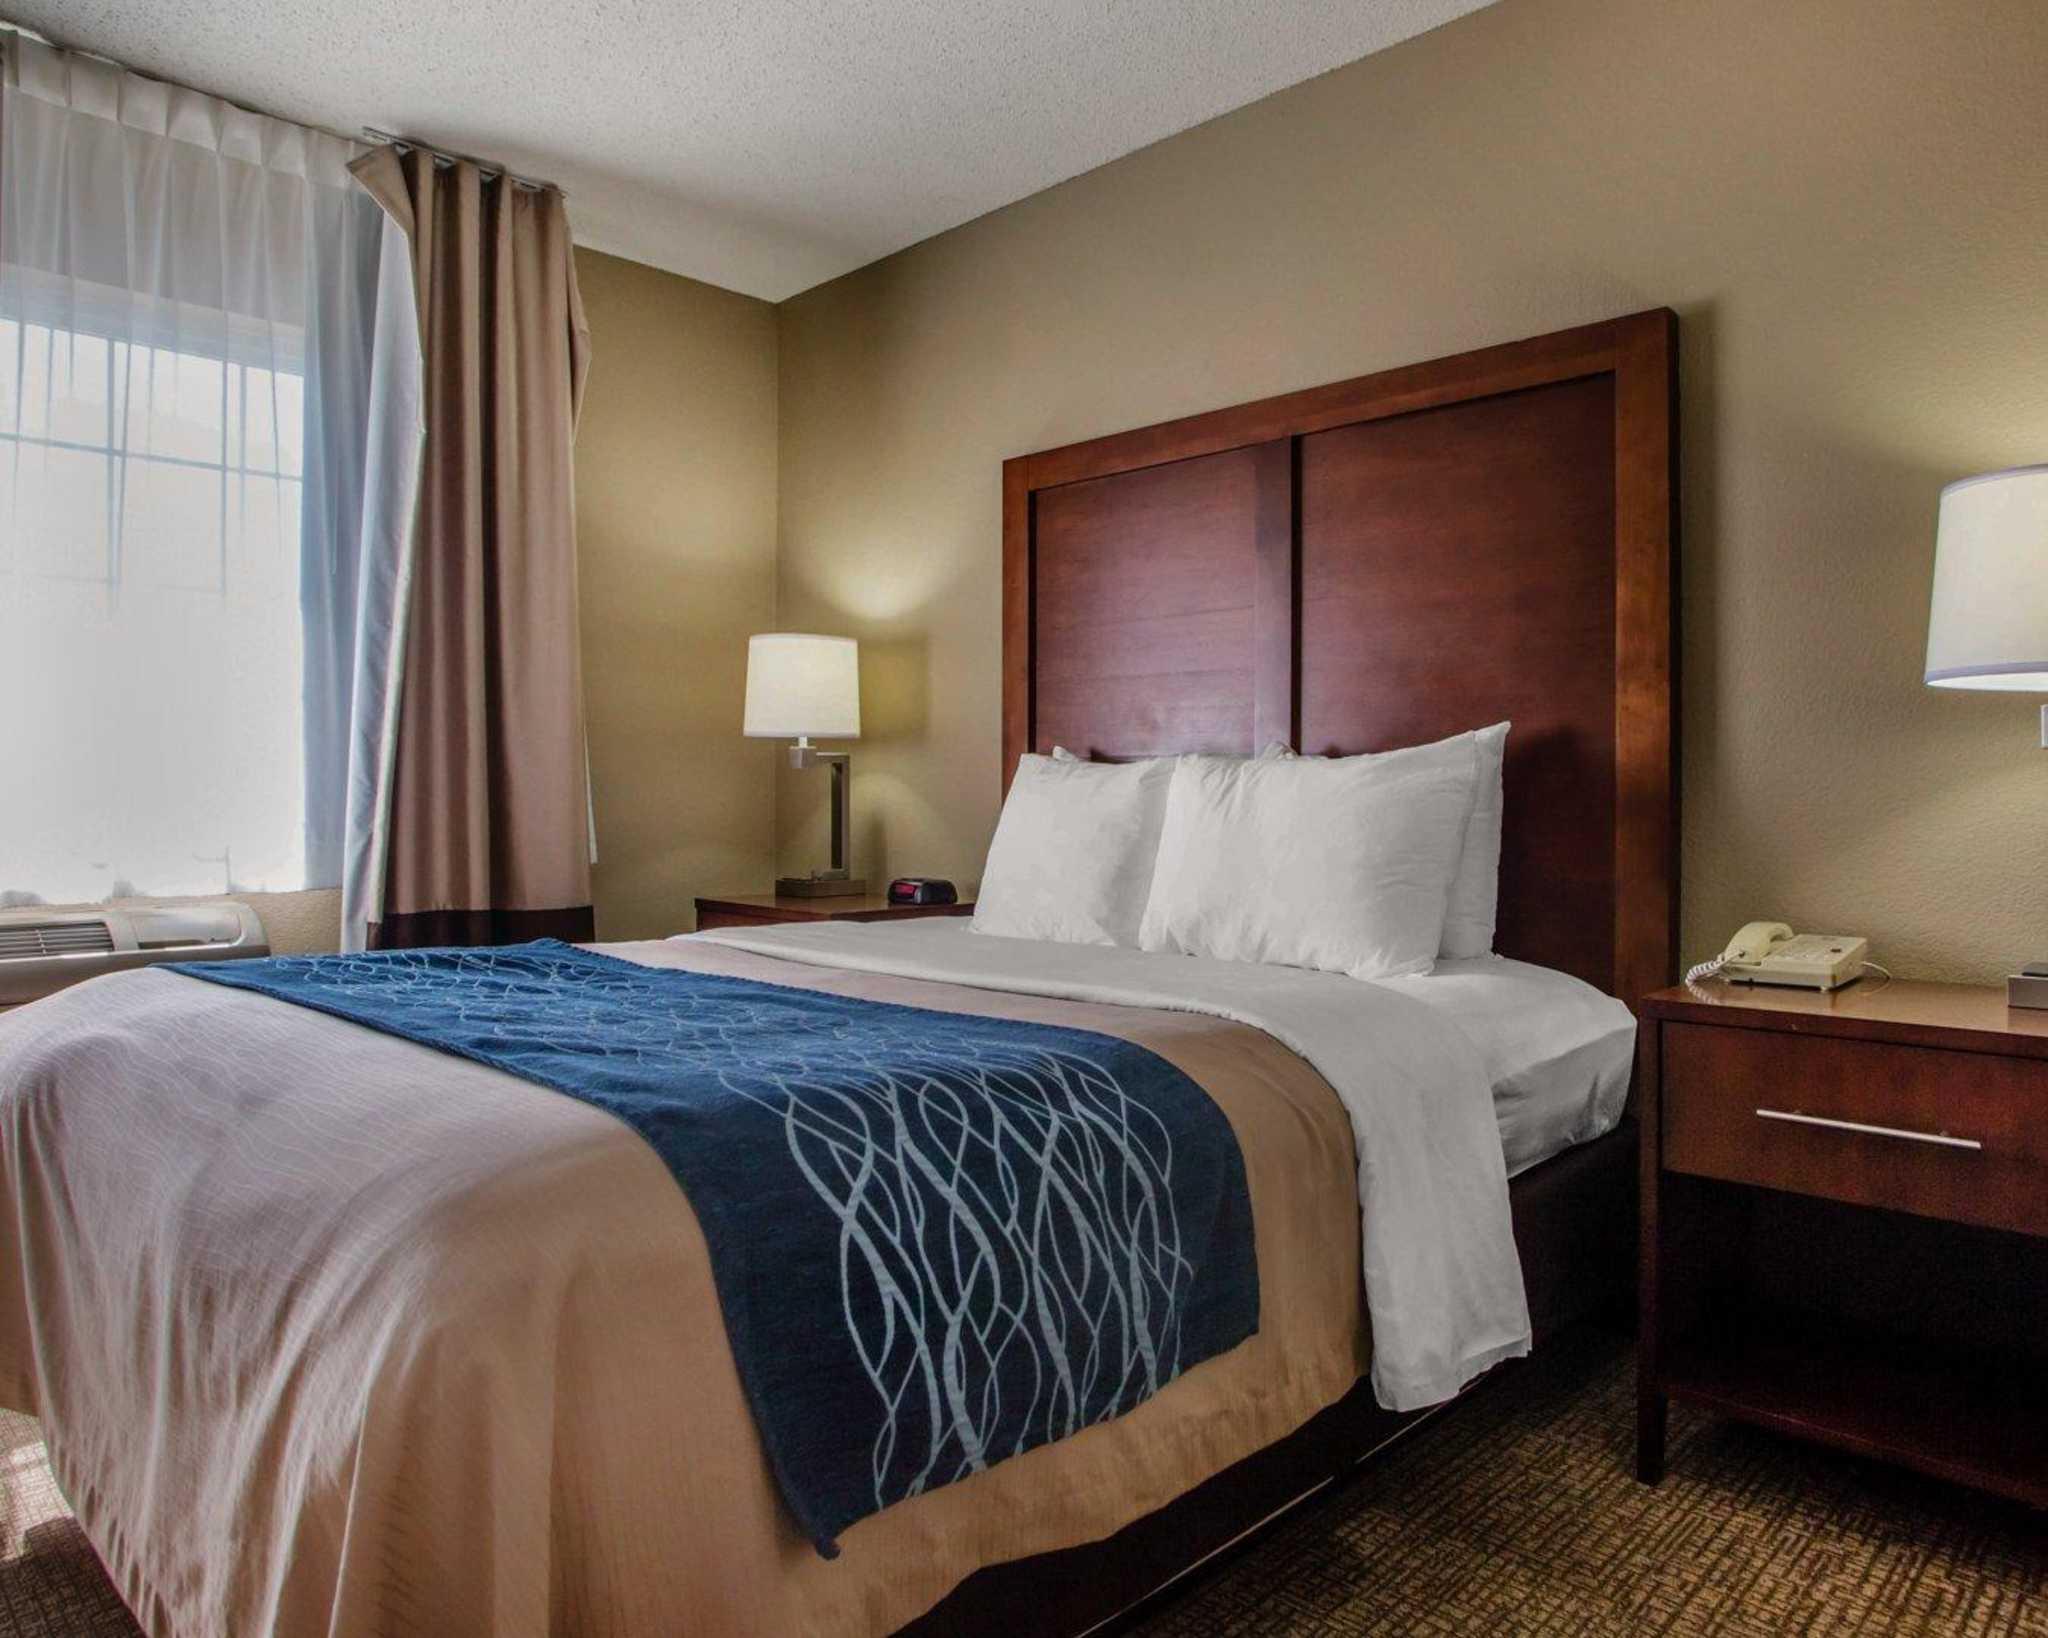 Comfort Inn & Suites Jackson - West Bend image 25